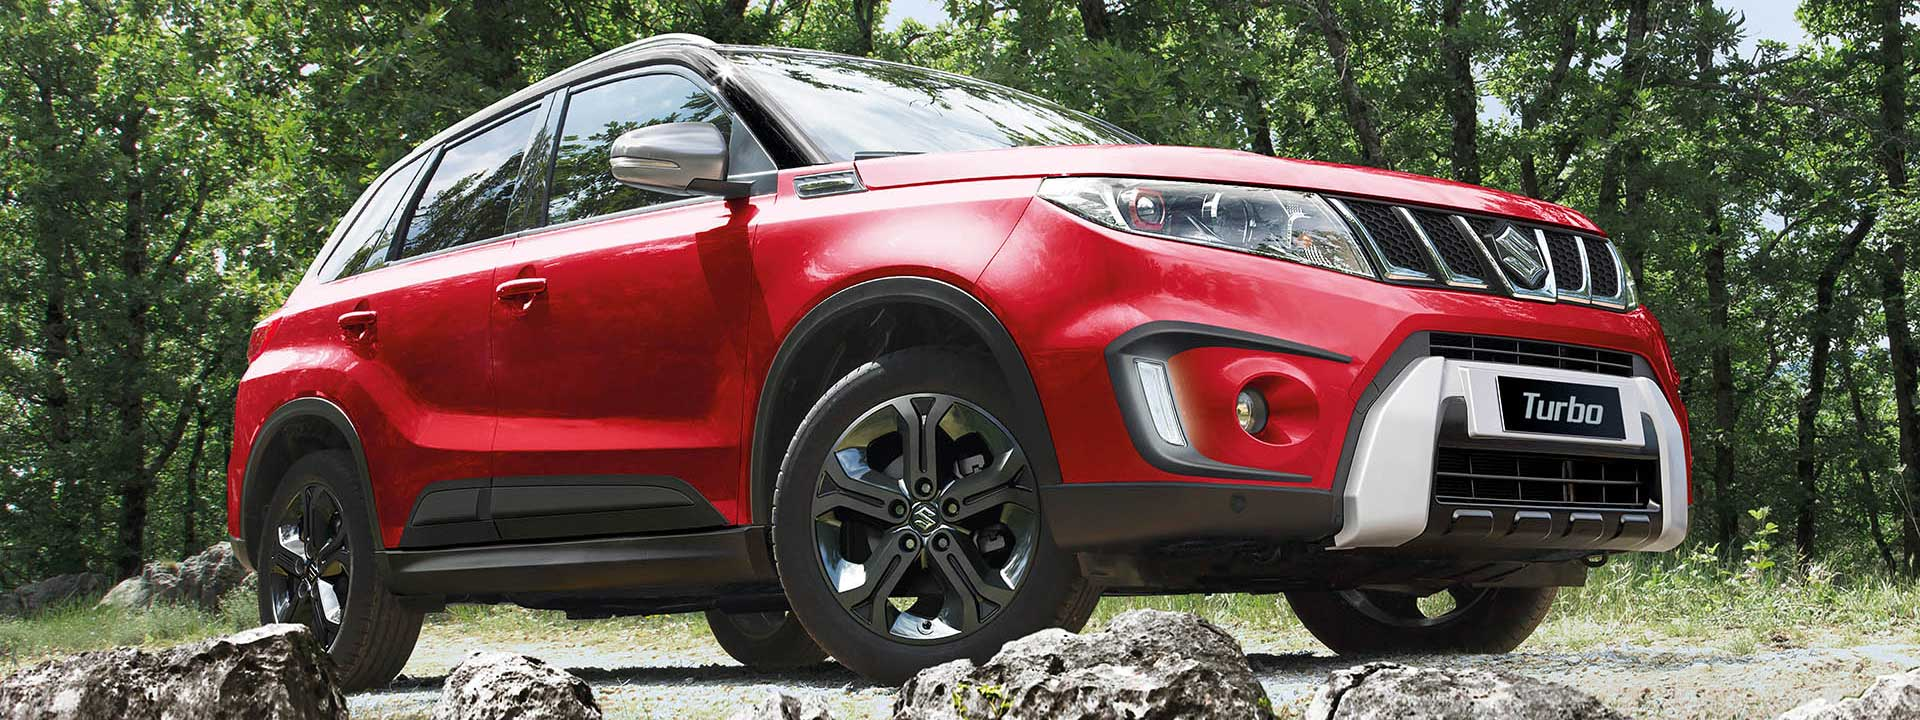 Suzuki Vitara Car Accessories Qld Grand Wiring Harness Safety Security